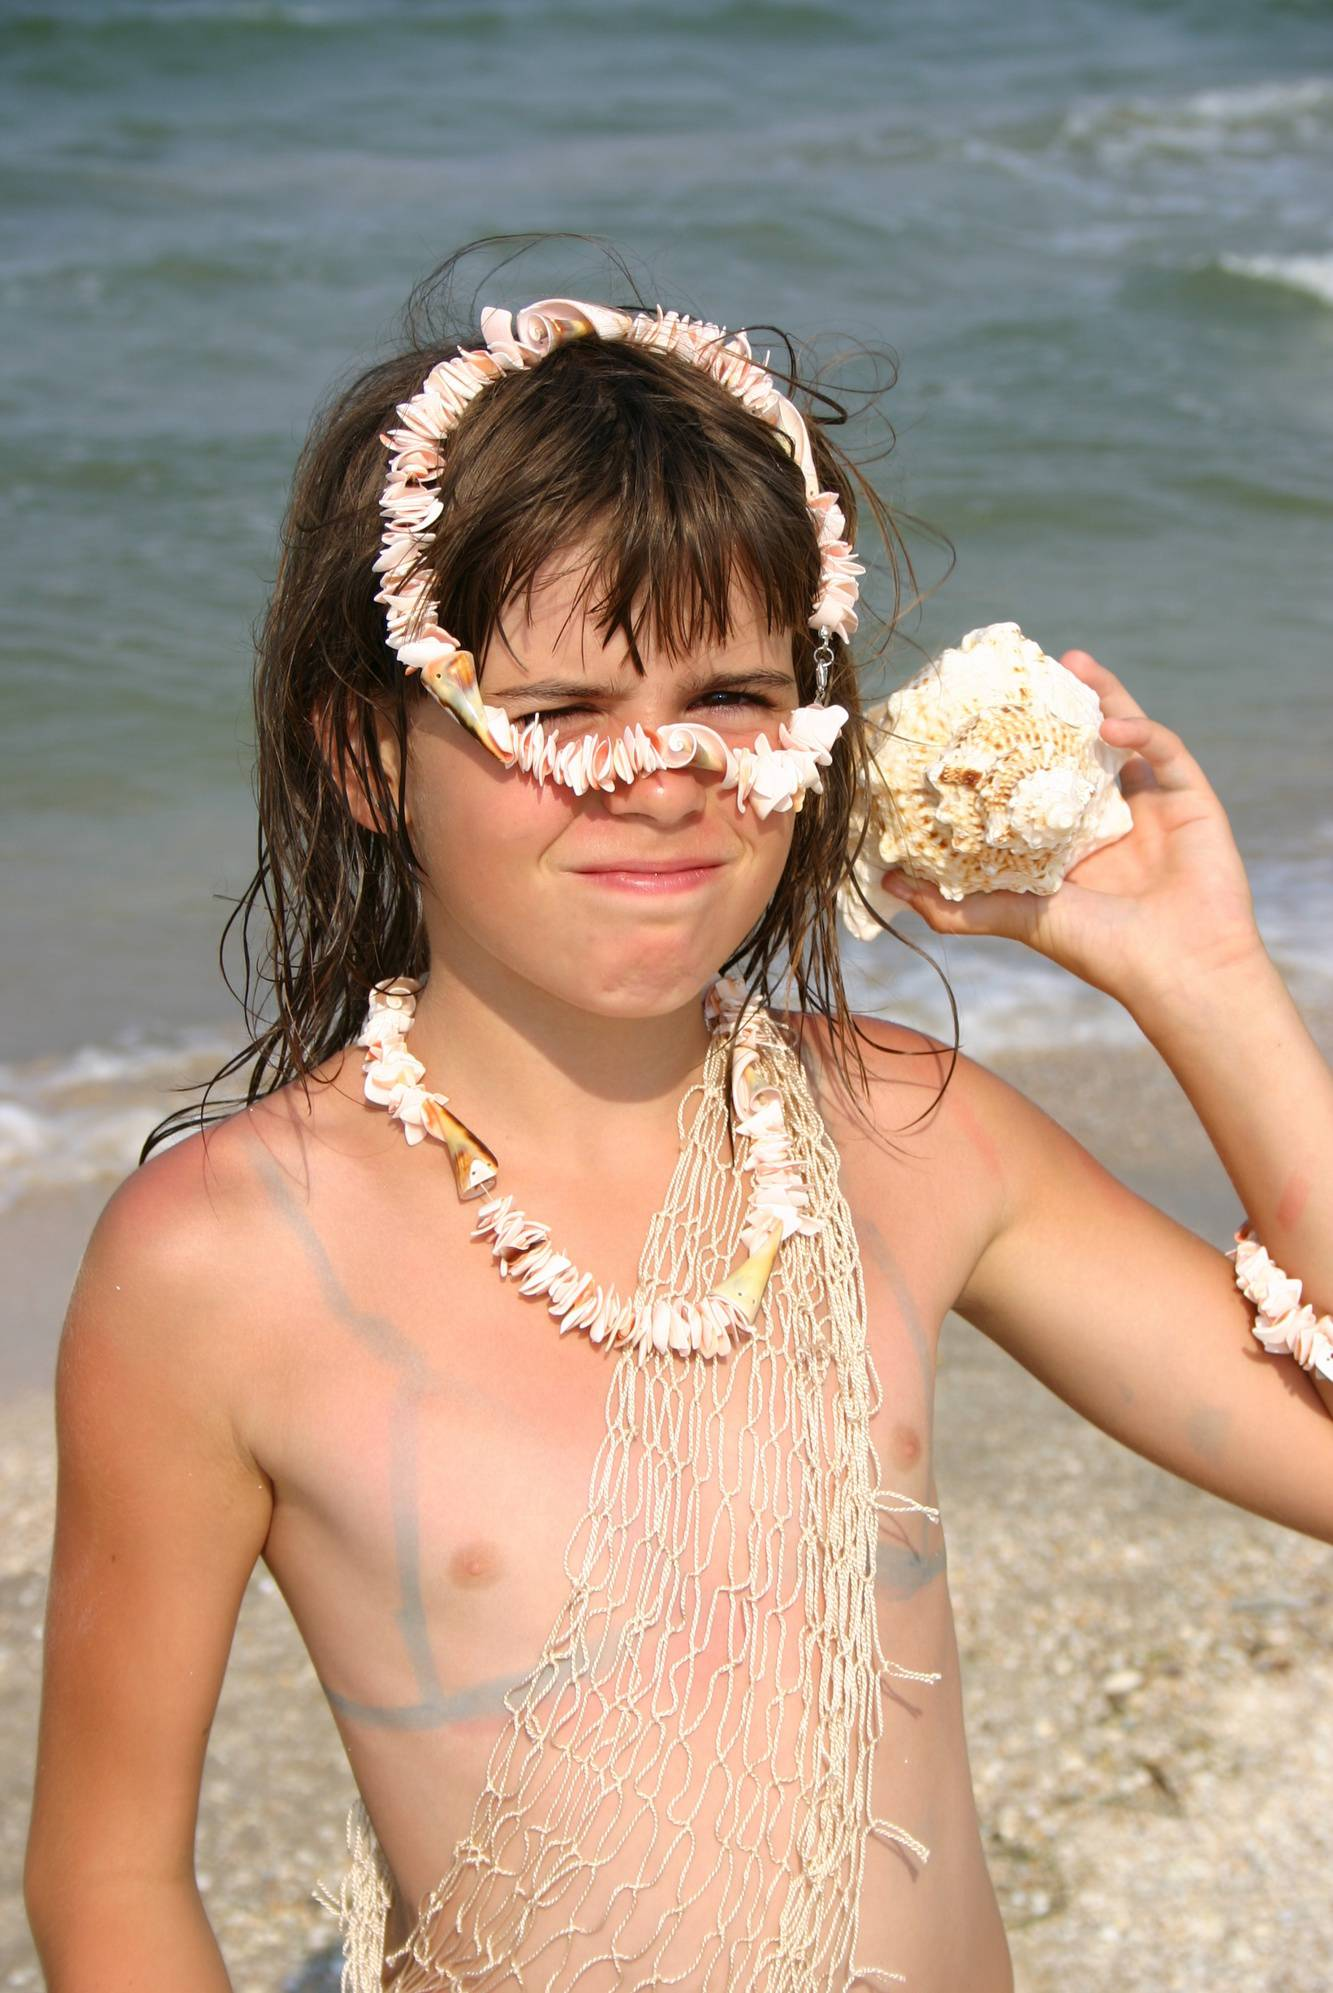 Nudist Gallery Nudist Girl Shell Wonder - 1